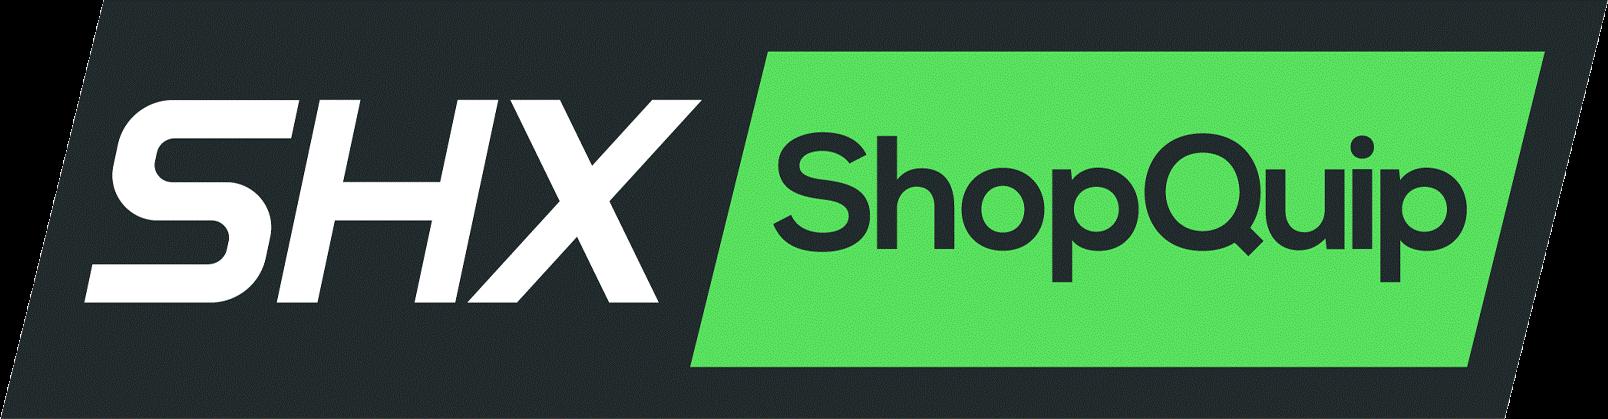 SHX_Logotyp